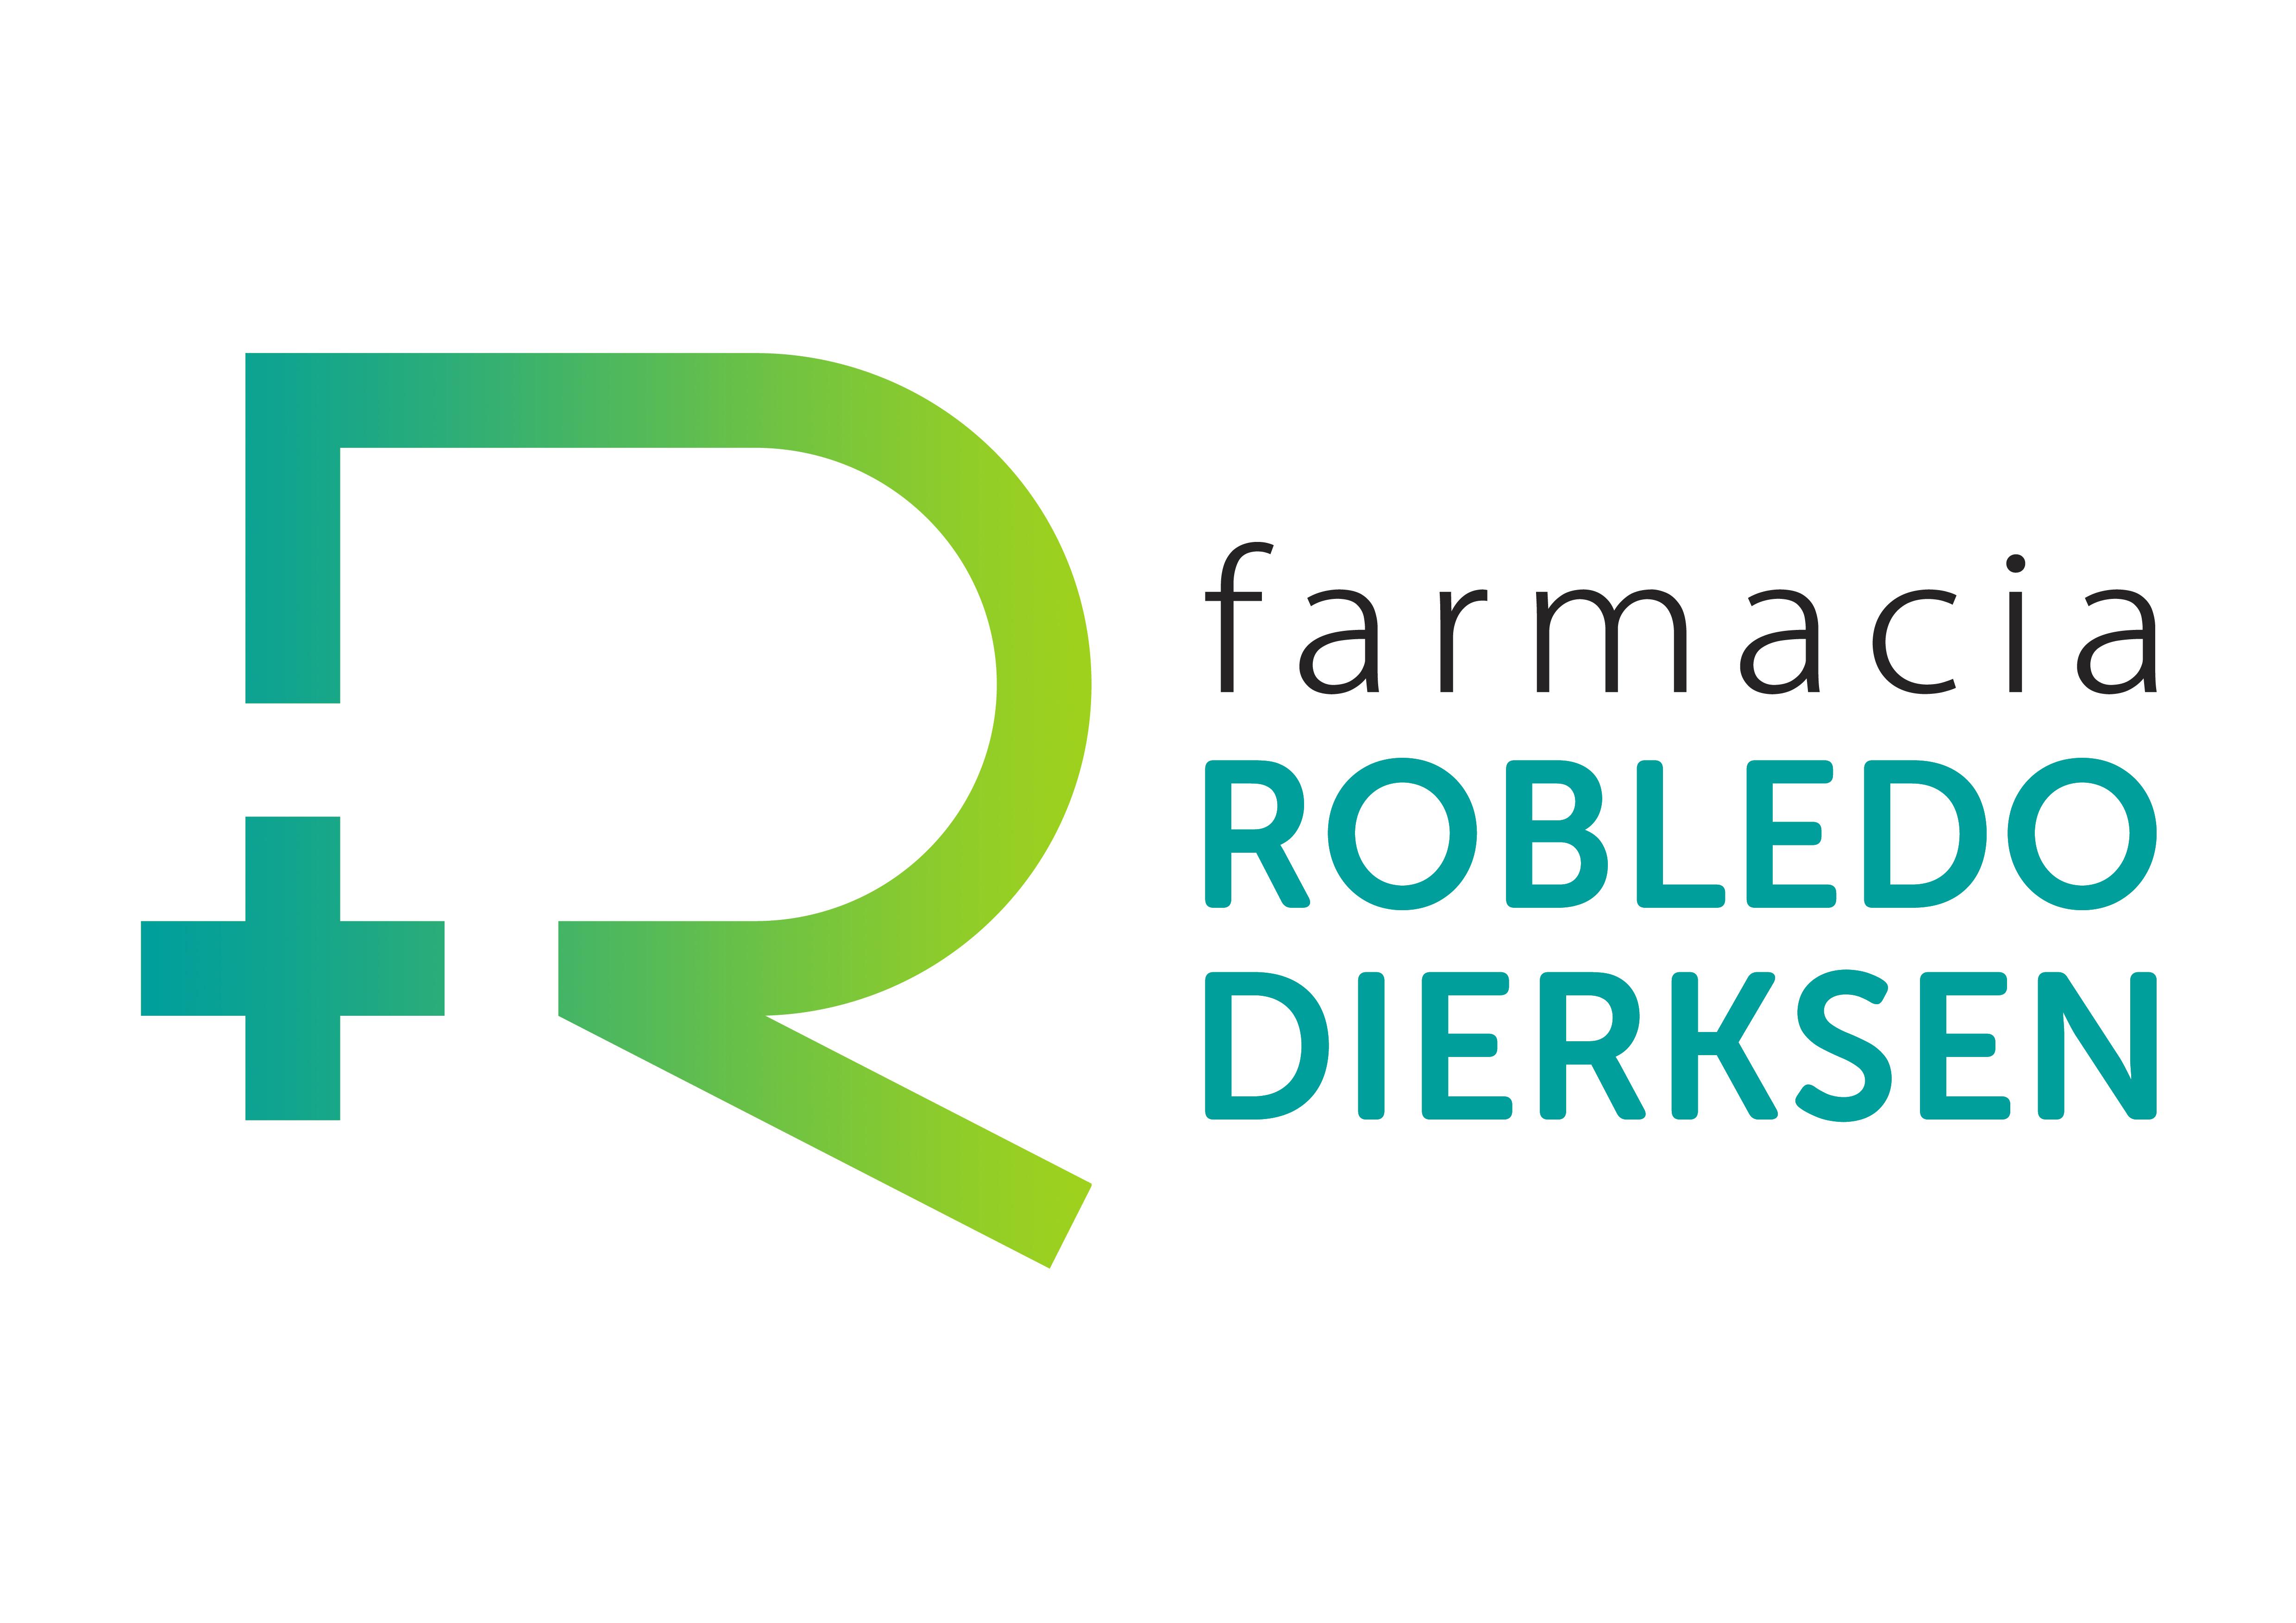 Farmacia Robledo Dierksen